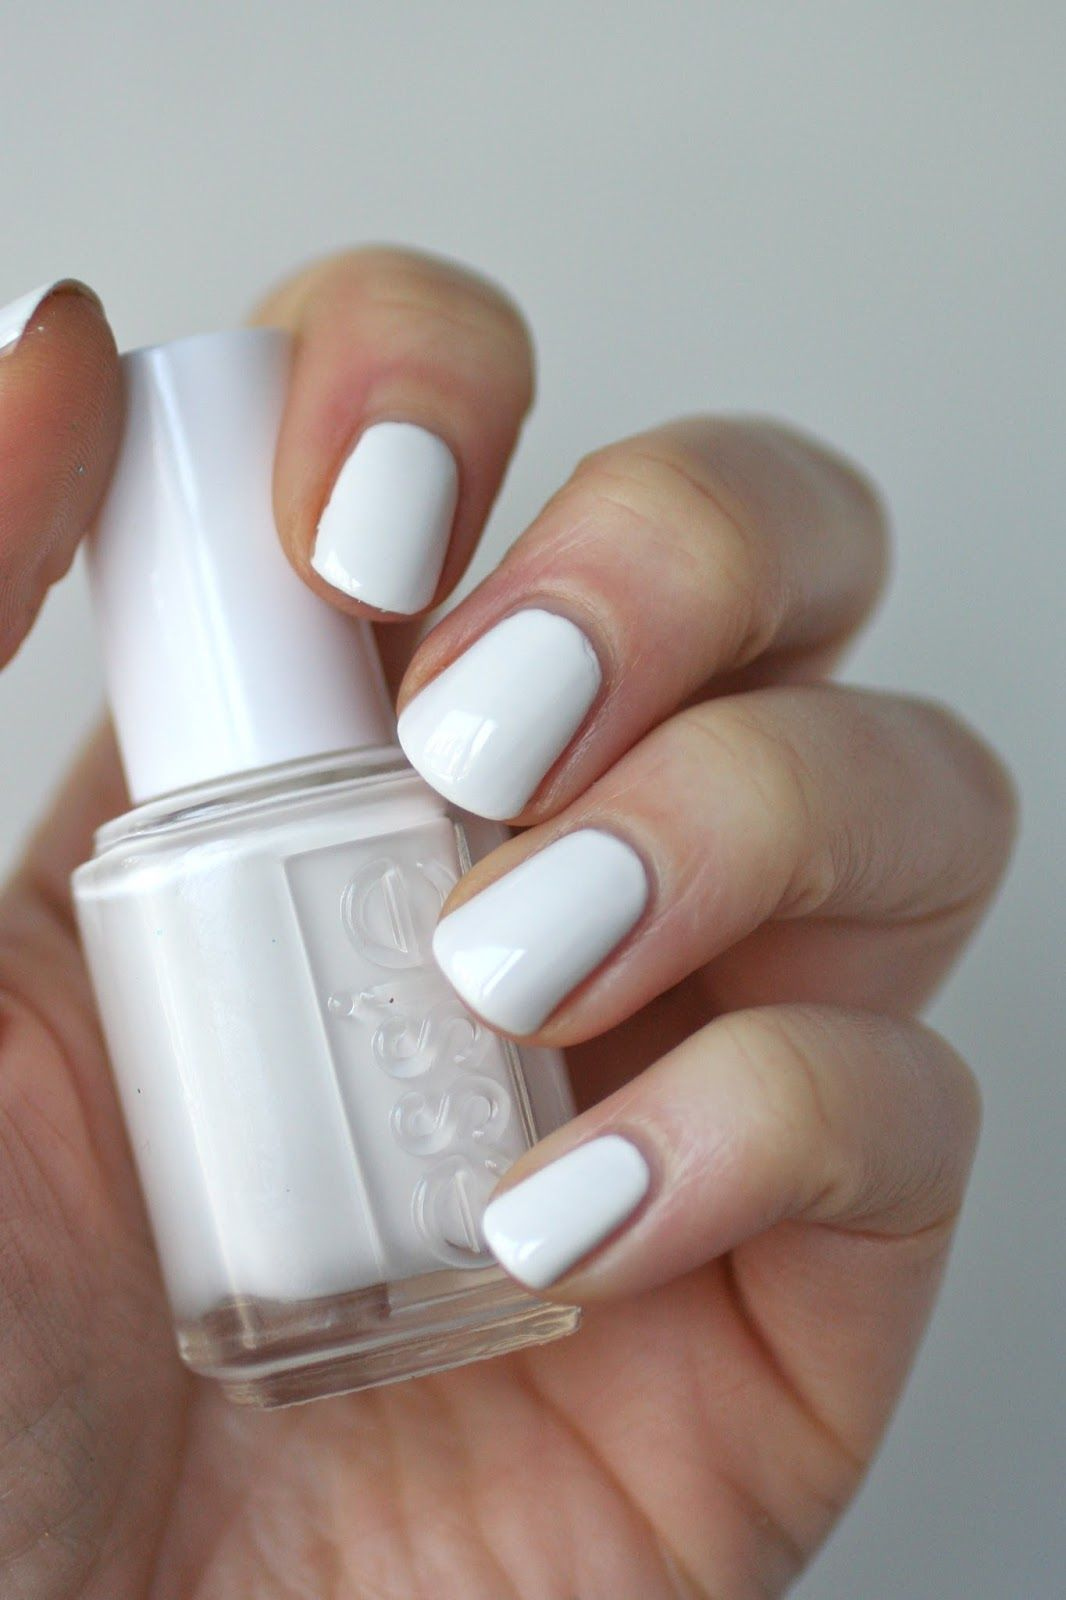 Classics : Essie Blanc - white #nail polish / lacquer / vernis ...